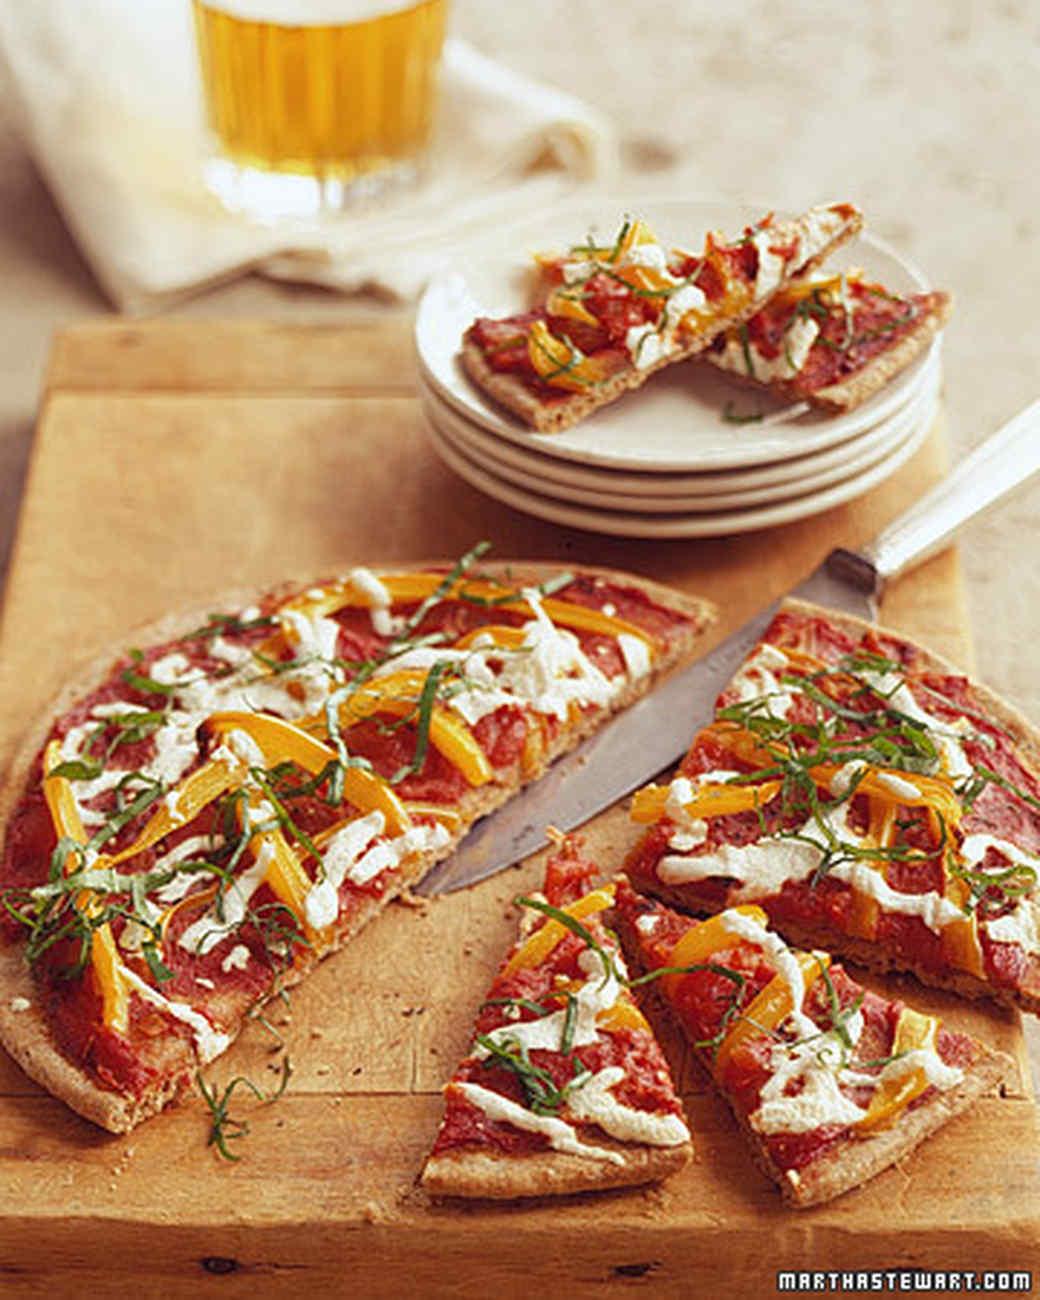 a98755_0701_pizza.jpg